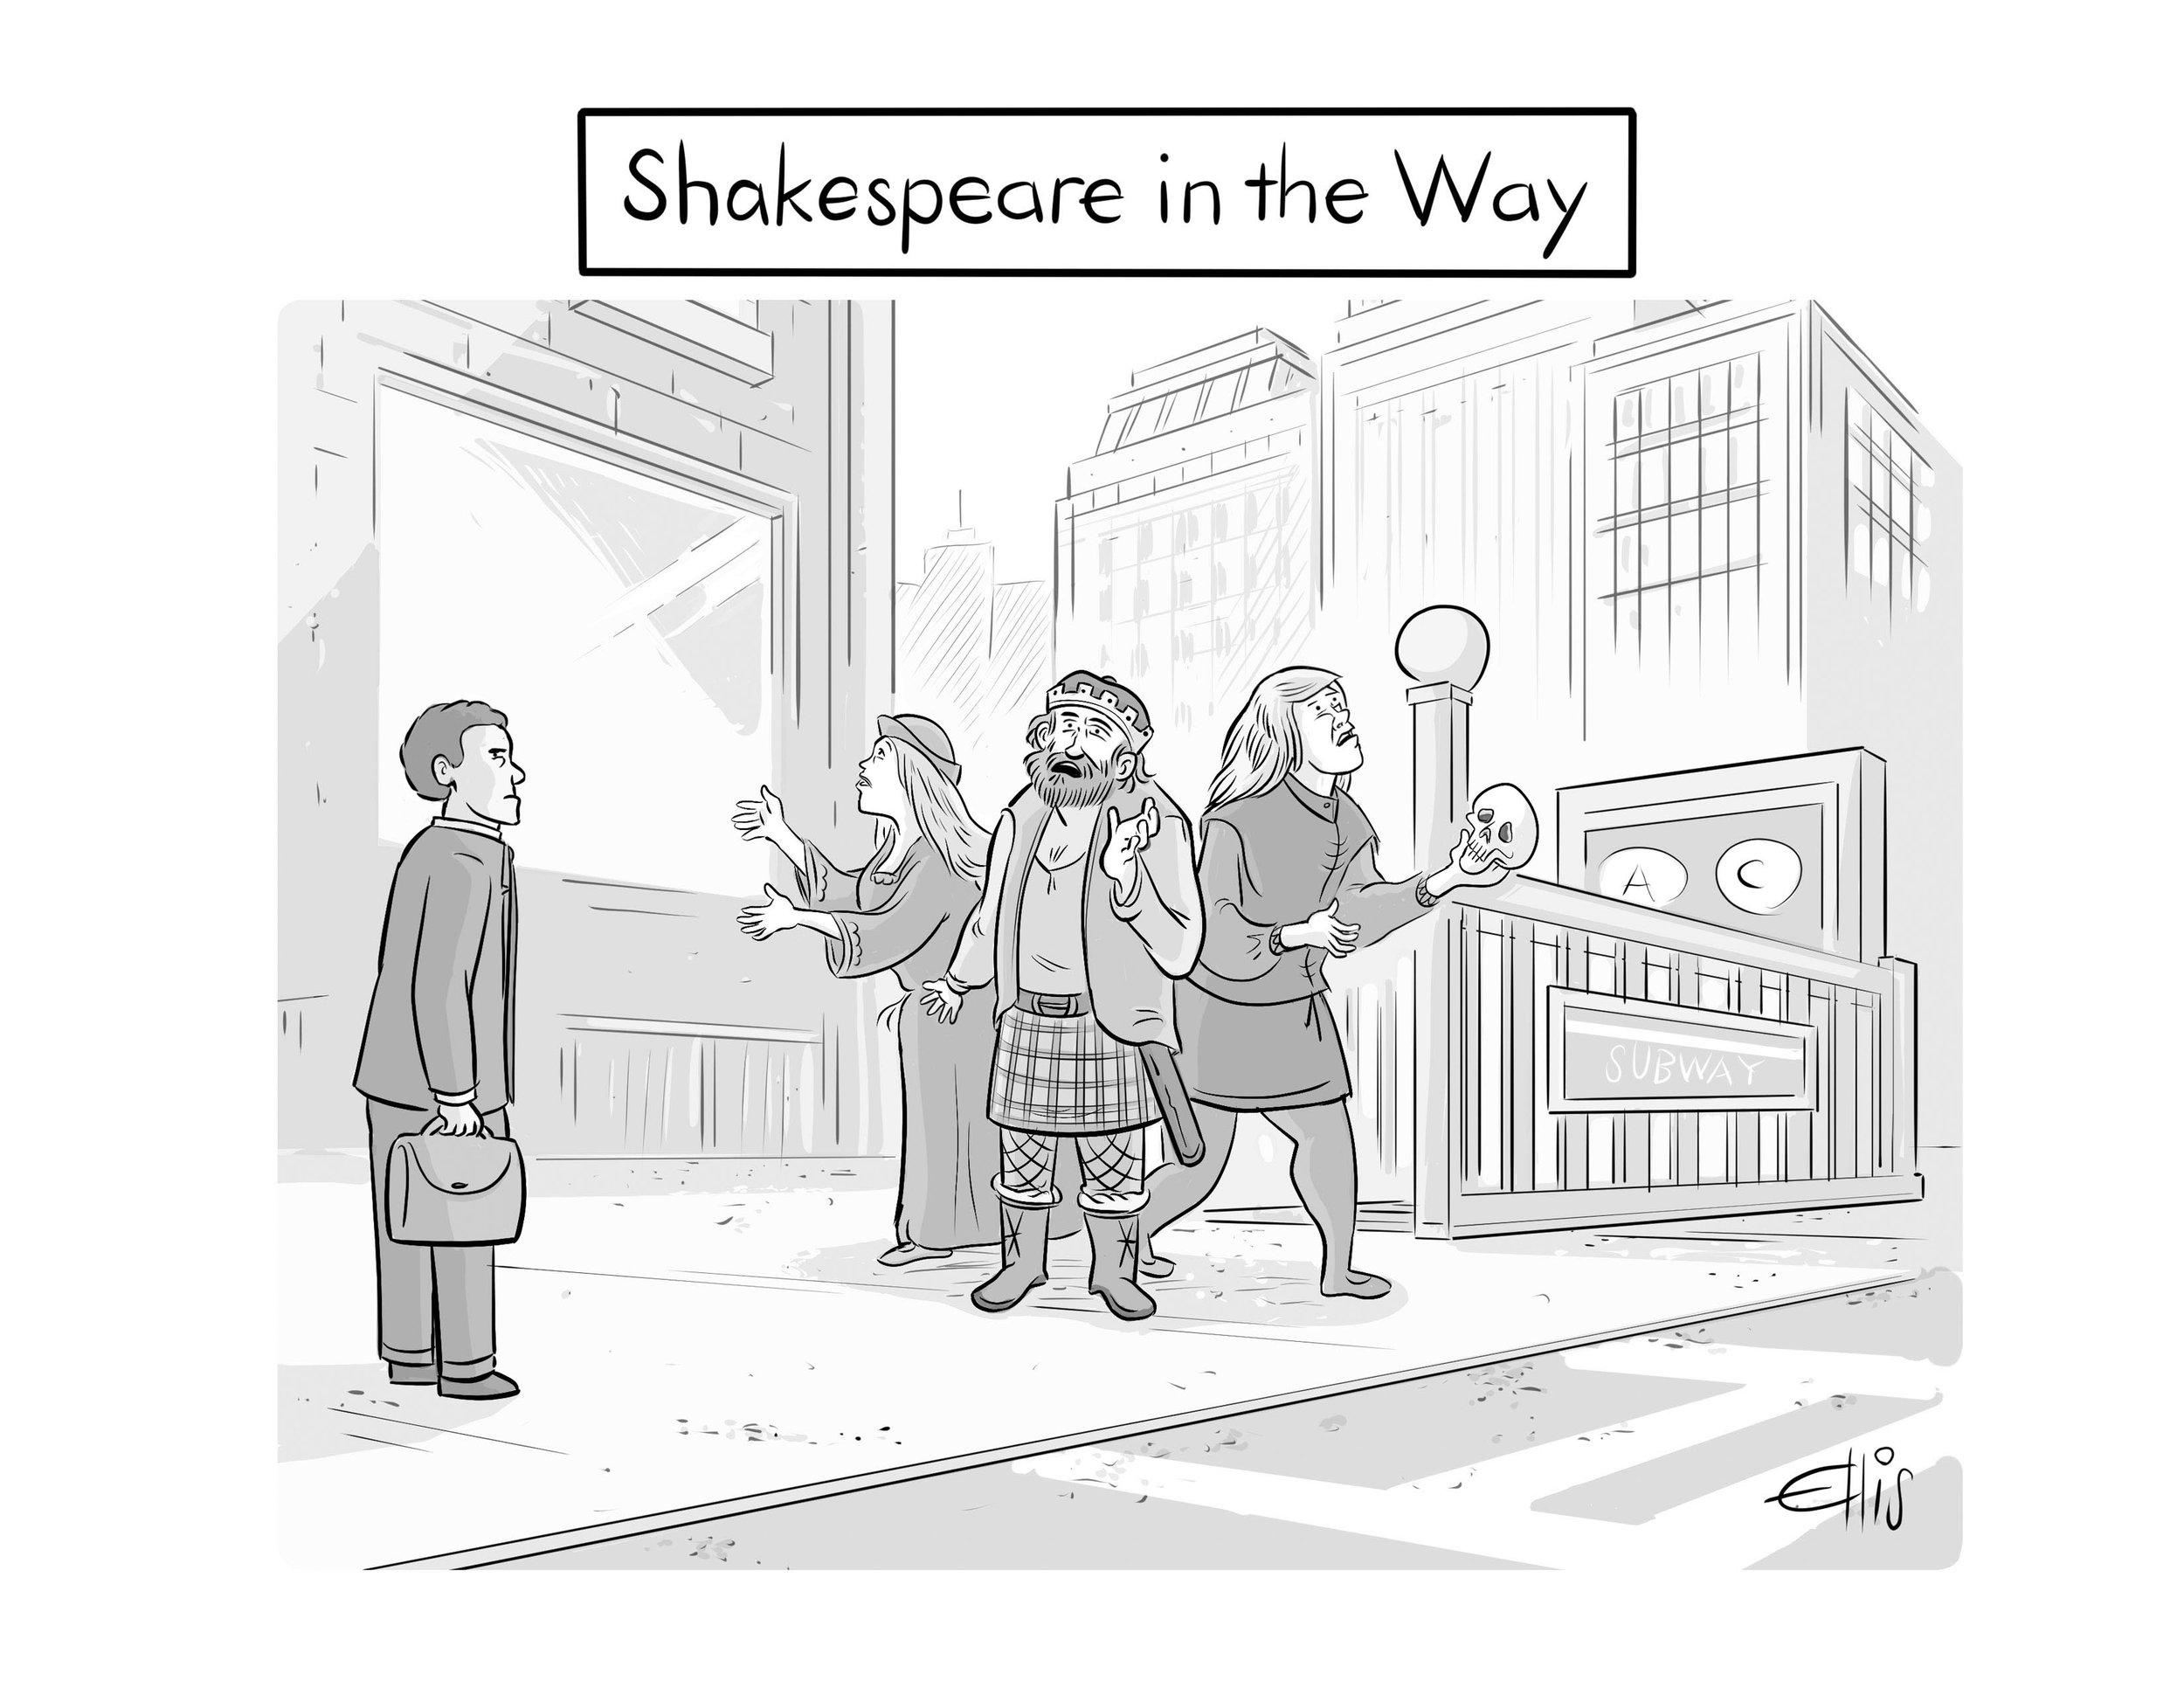 Shakespeare_In_the_Way.jpg